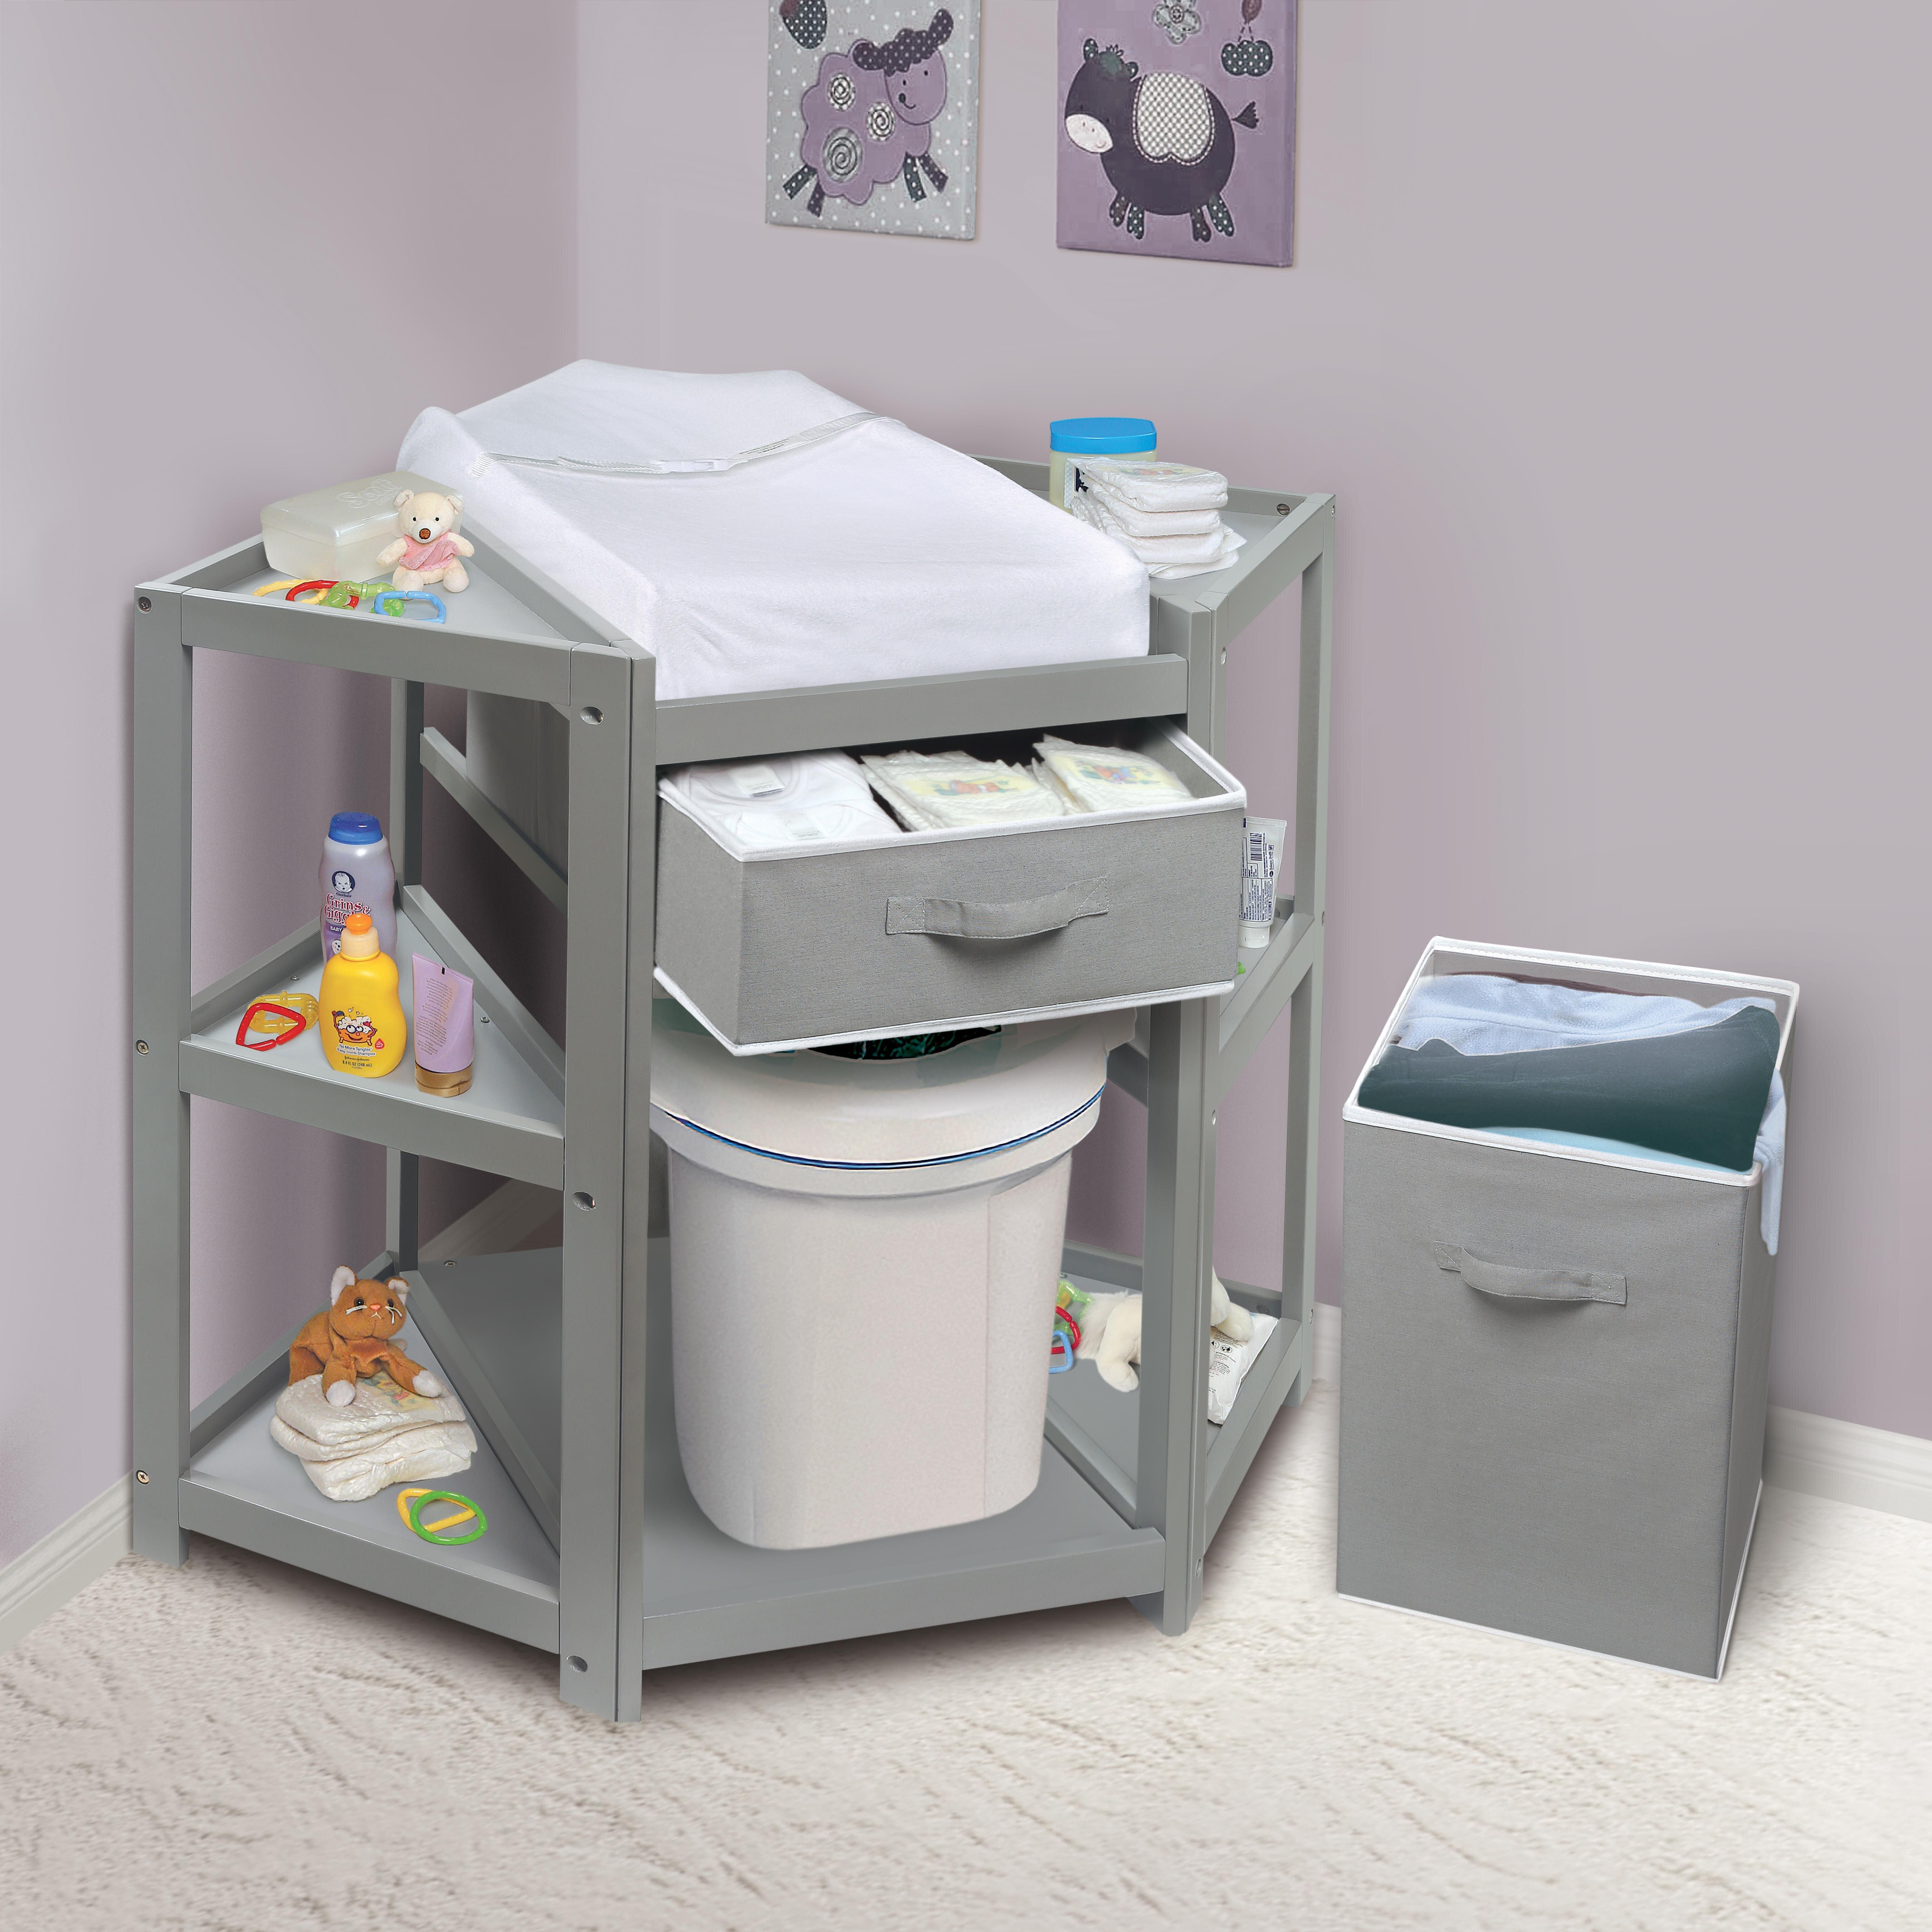 Badger Basket Diaper Corner Baby Changing Table | Wayfair